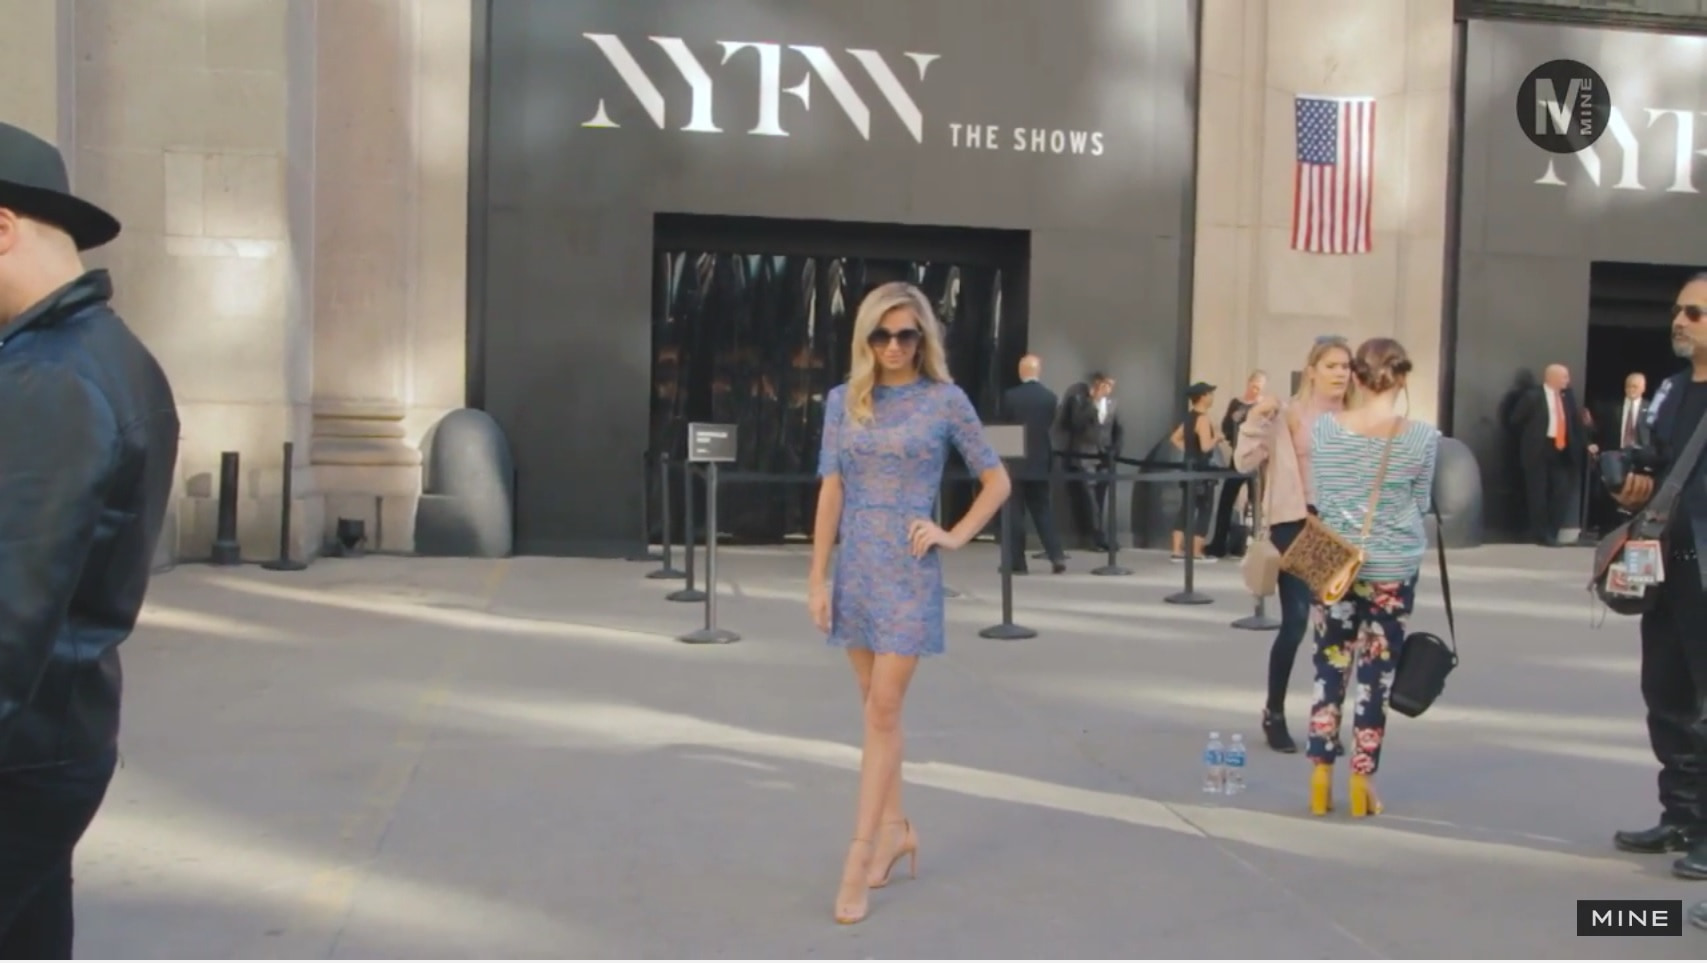 【New York Fashion Week】Skylight at Moynihan Stationの前でパパラッチ